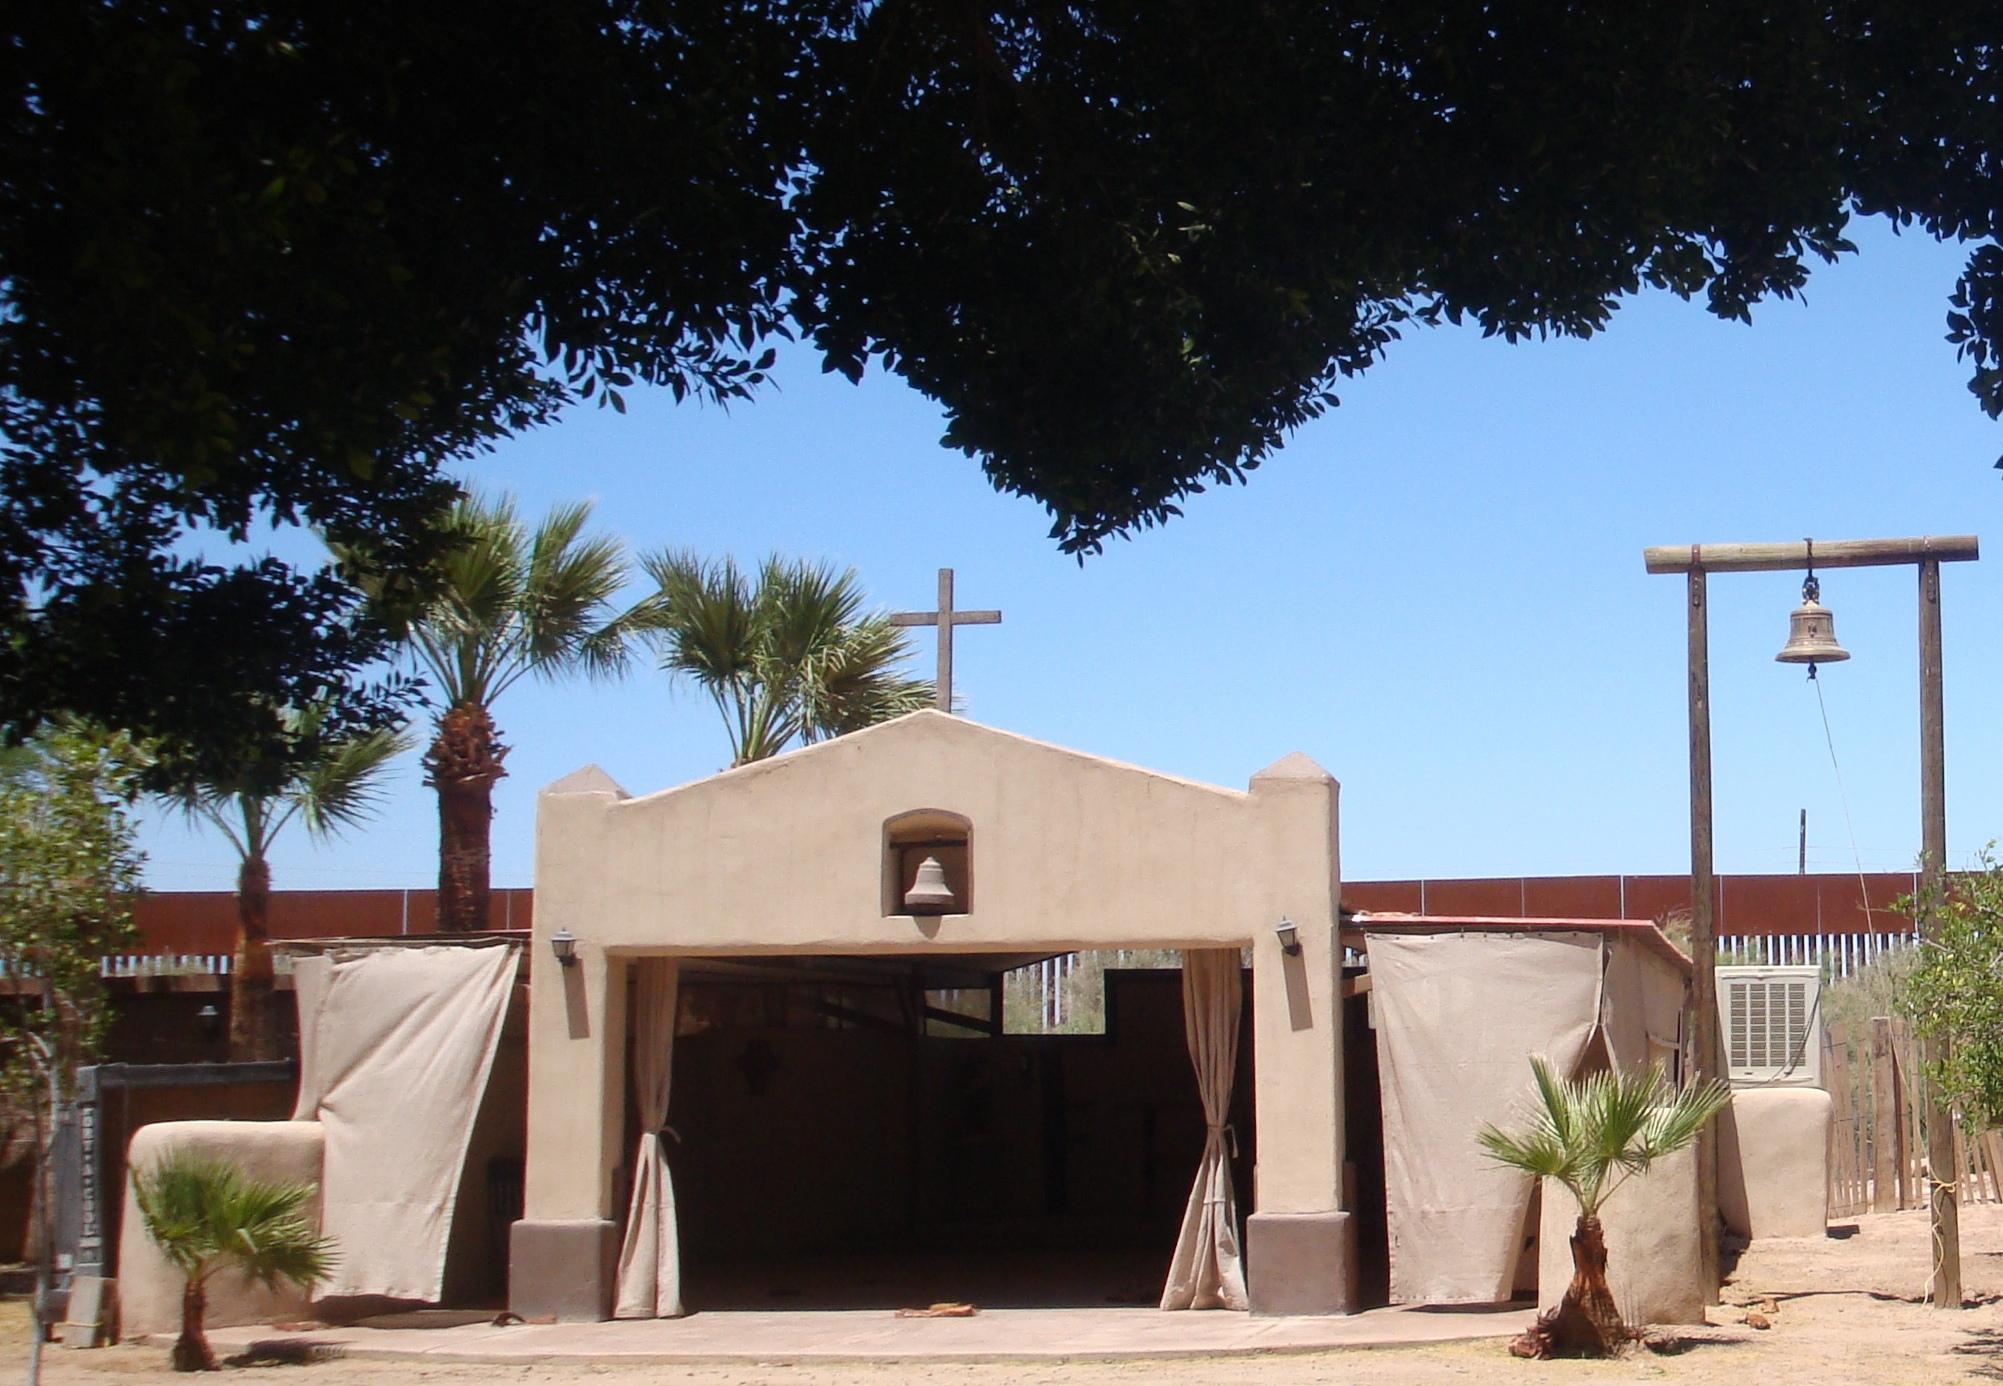 adobe.church